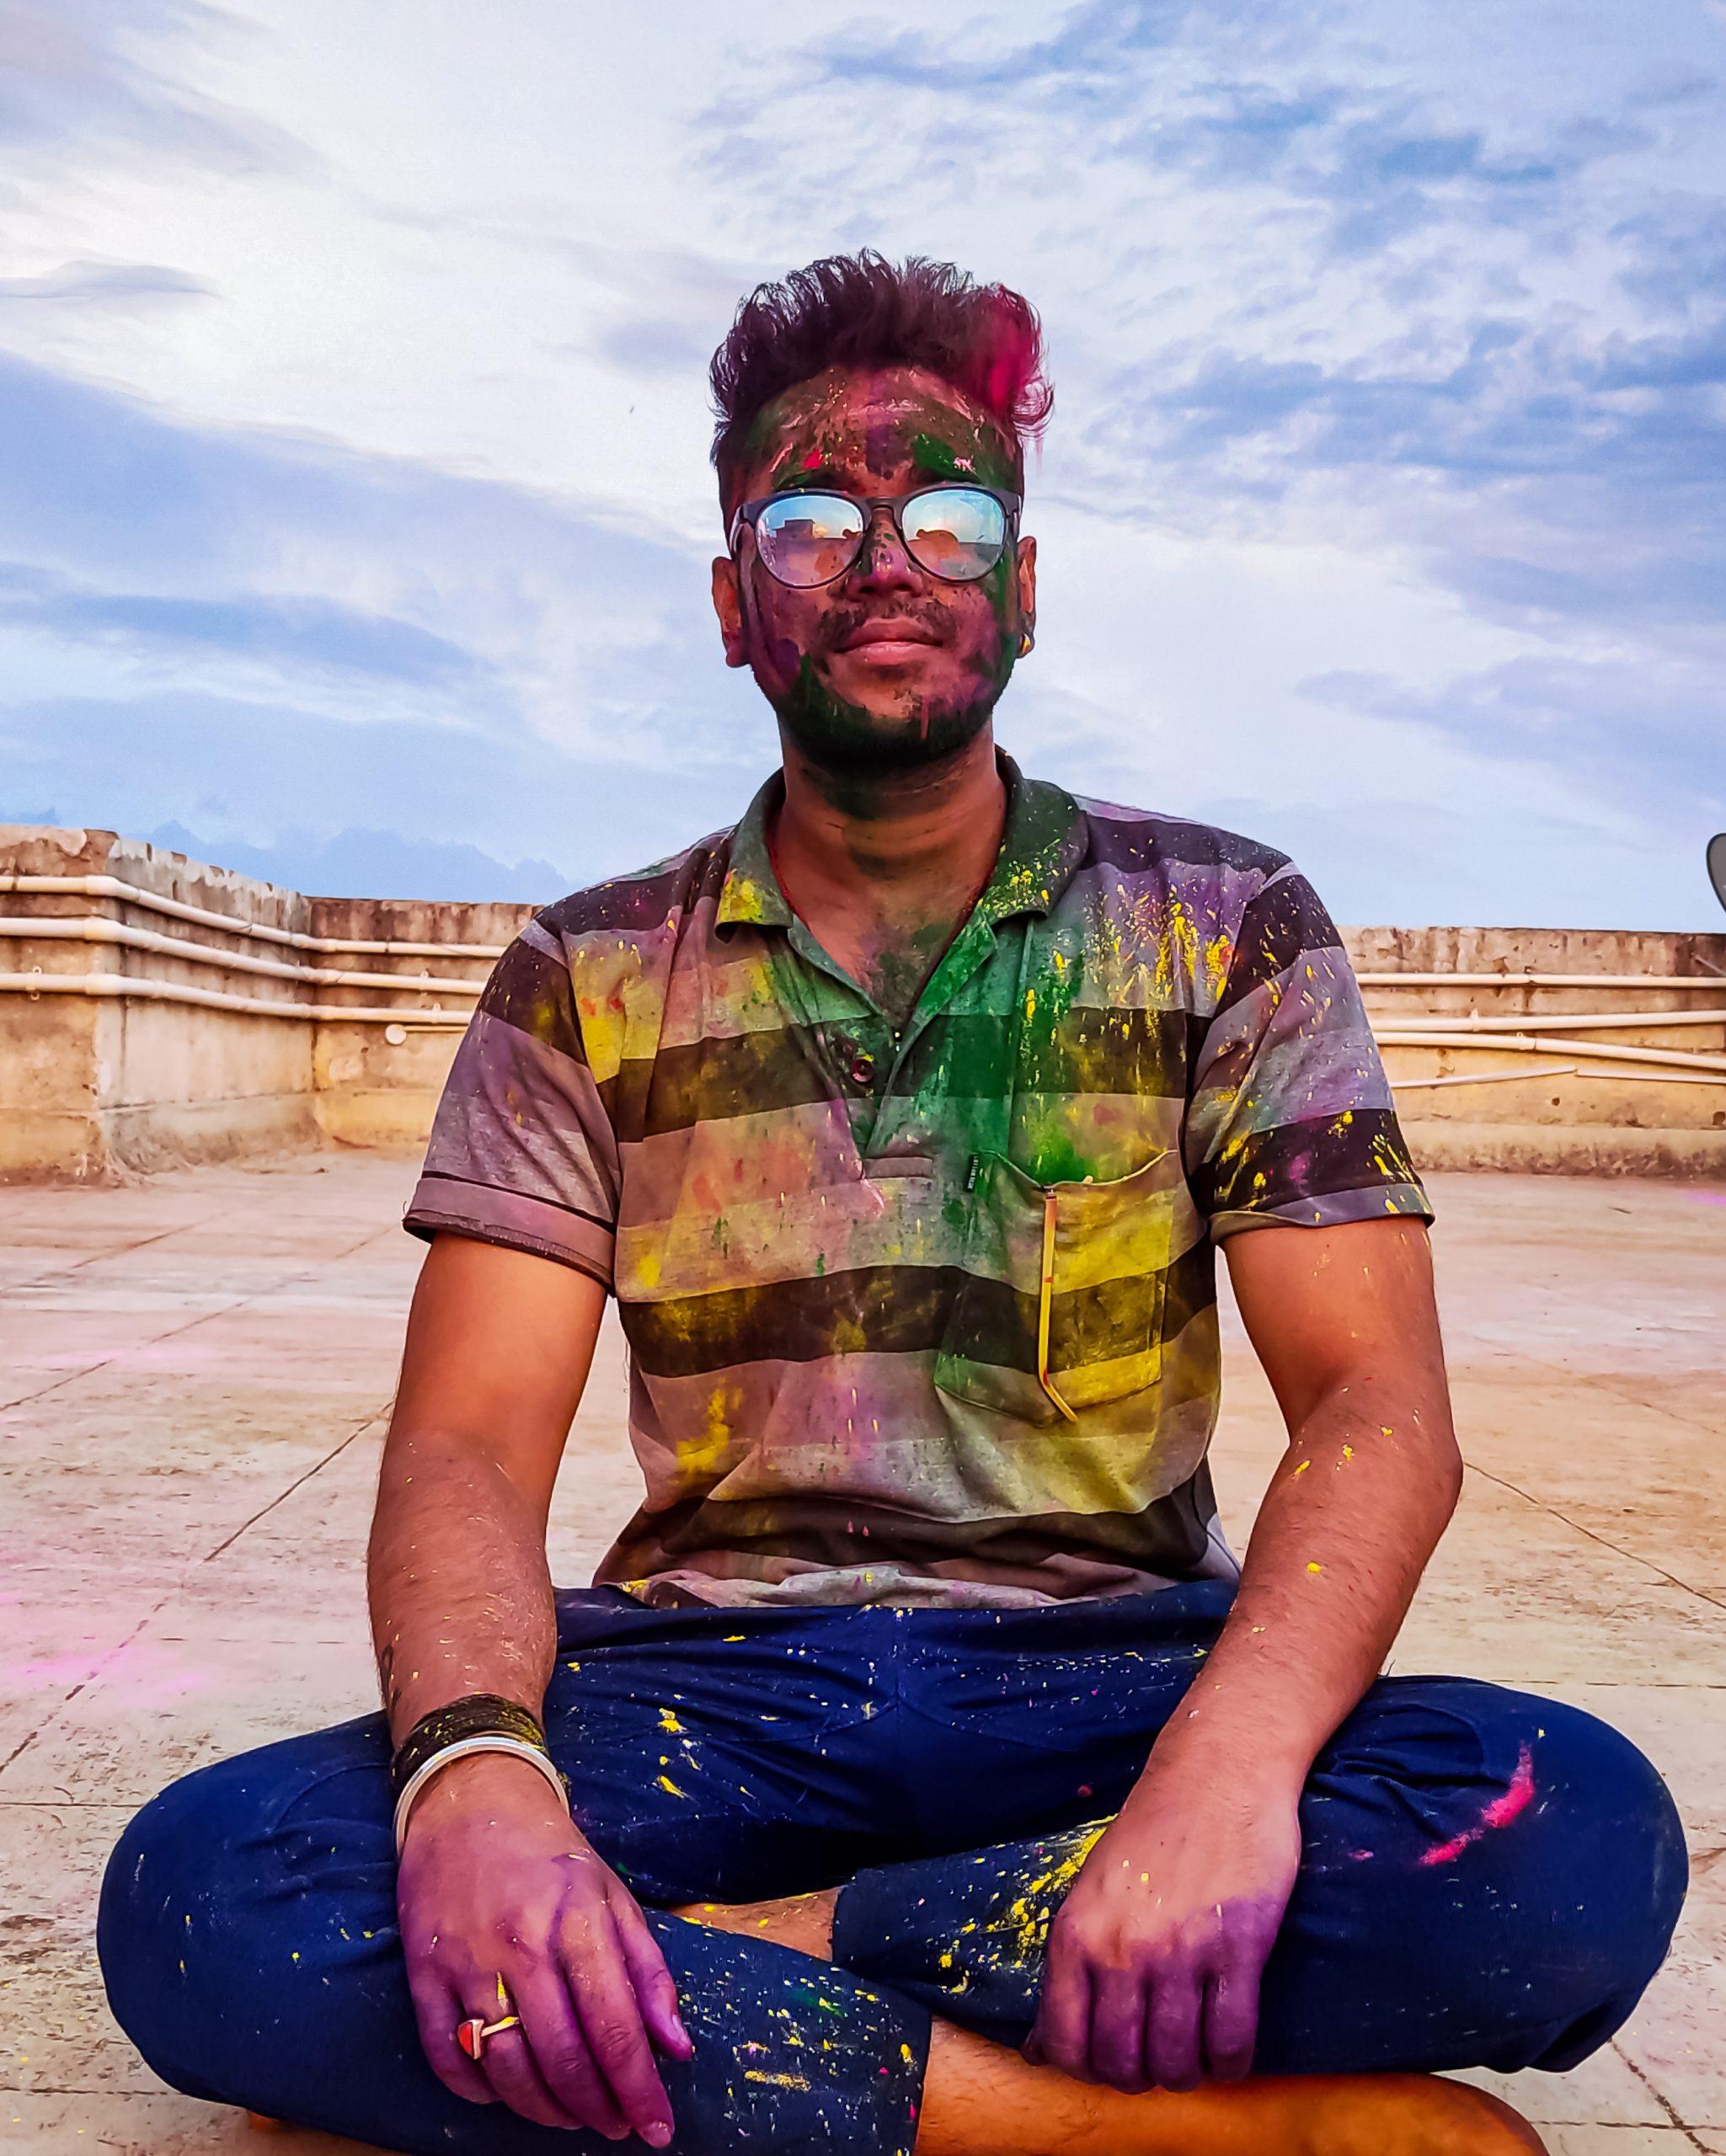 A boy celebrating Holi festival